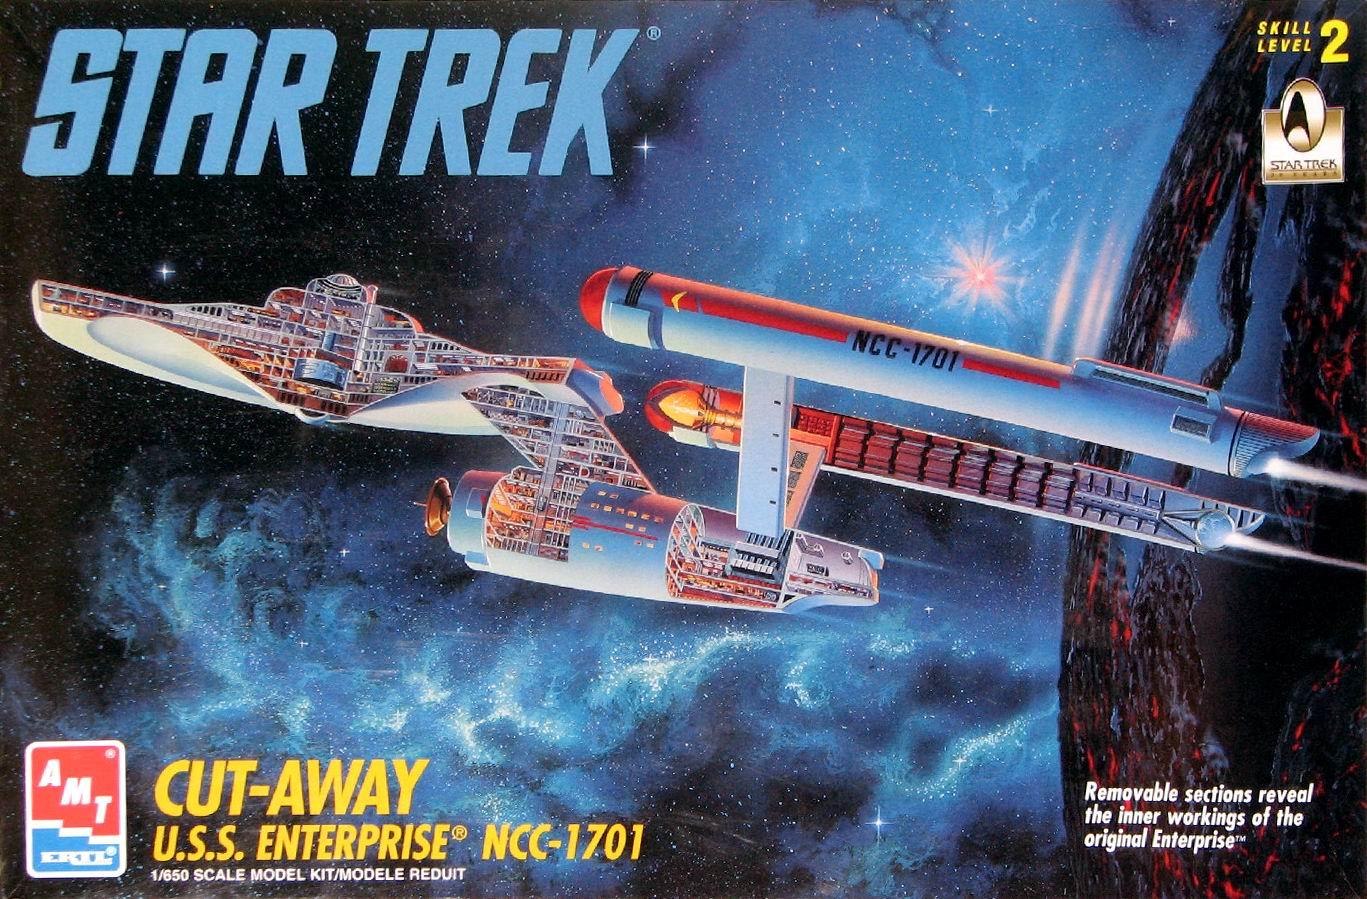 AMT Model kit 8790 Cut-Away USS Enterprise 1996.jpg